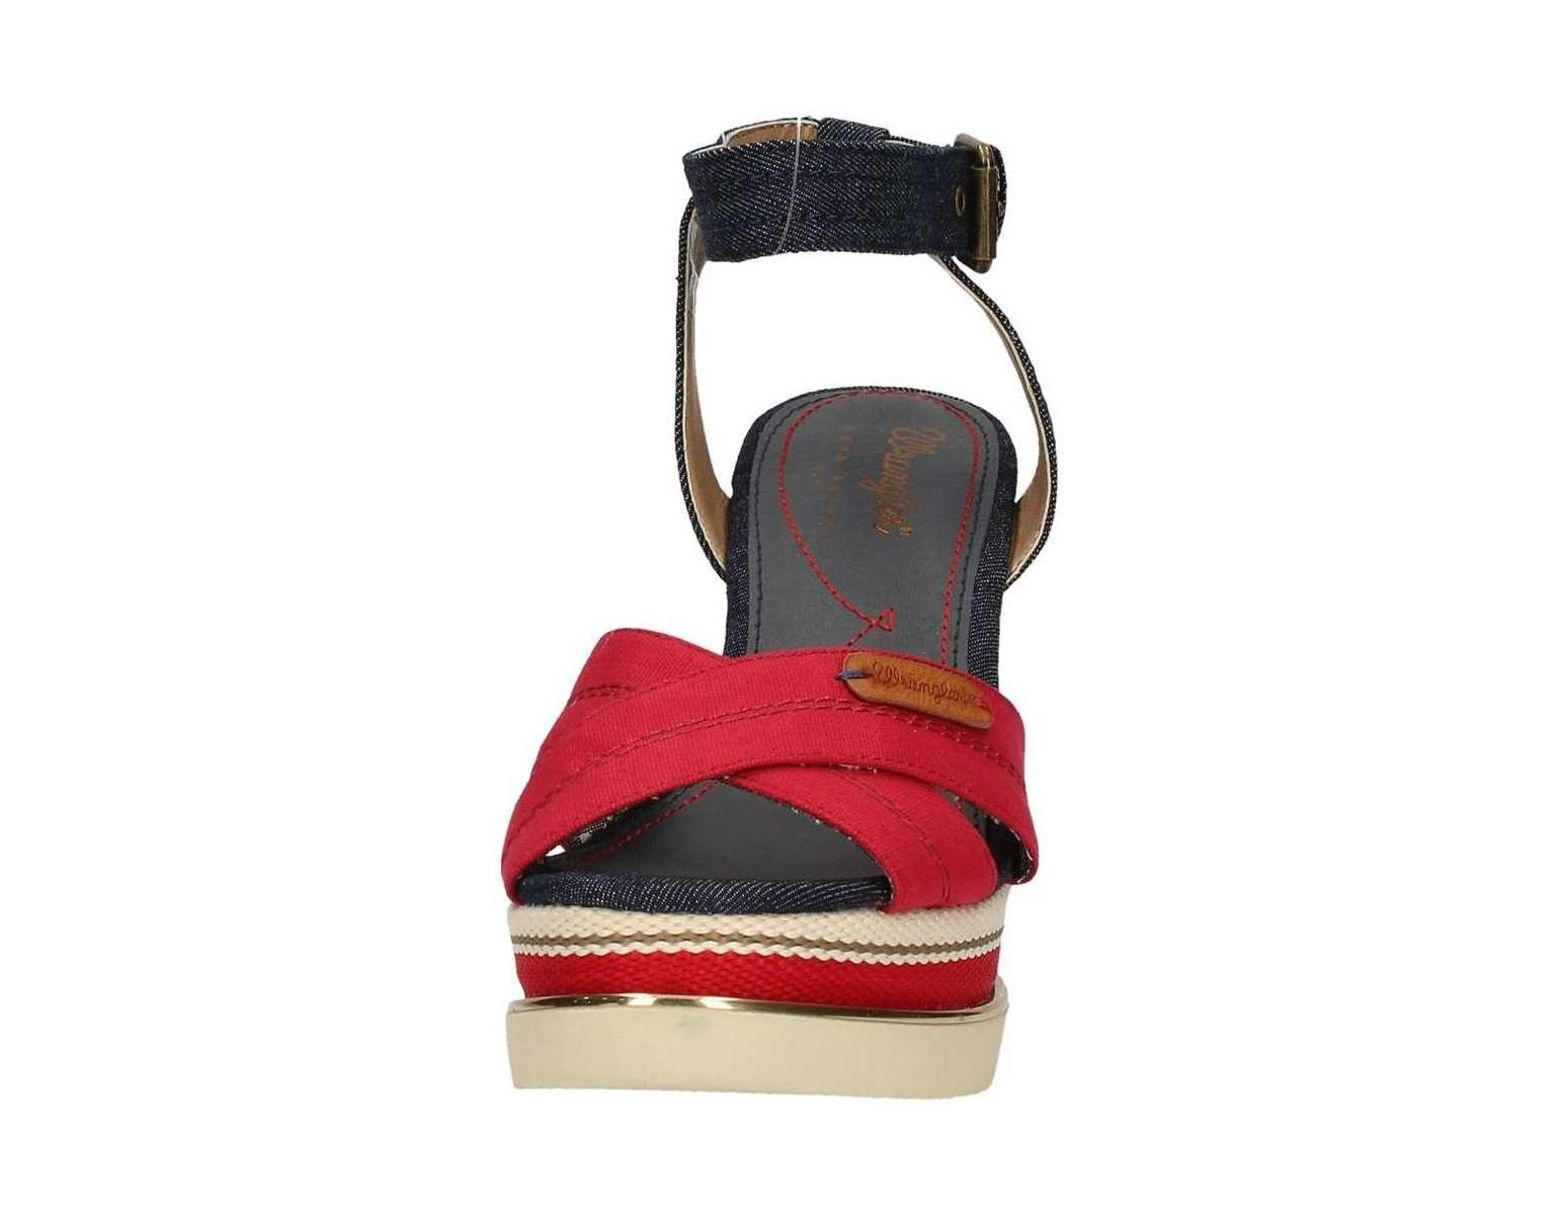 Femmes Sandales Rouge En 0k8wxnop Wl181700 LSzMpGqUV